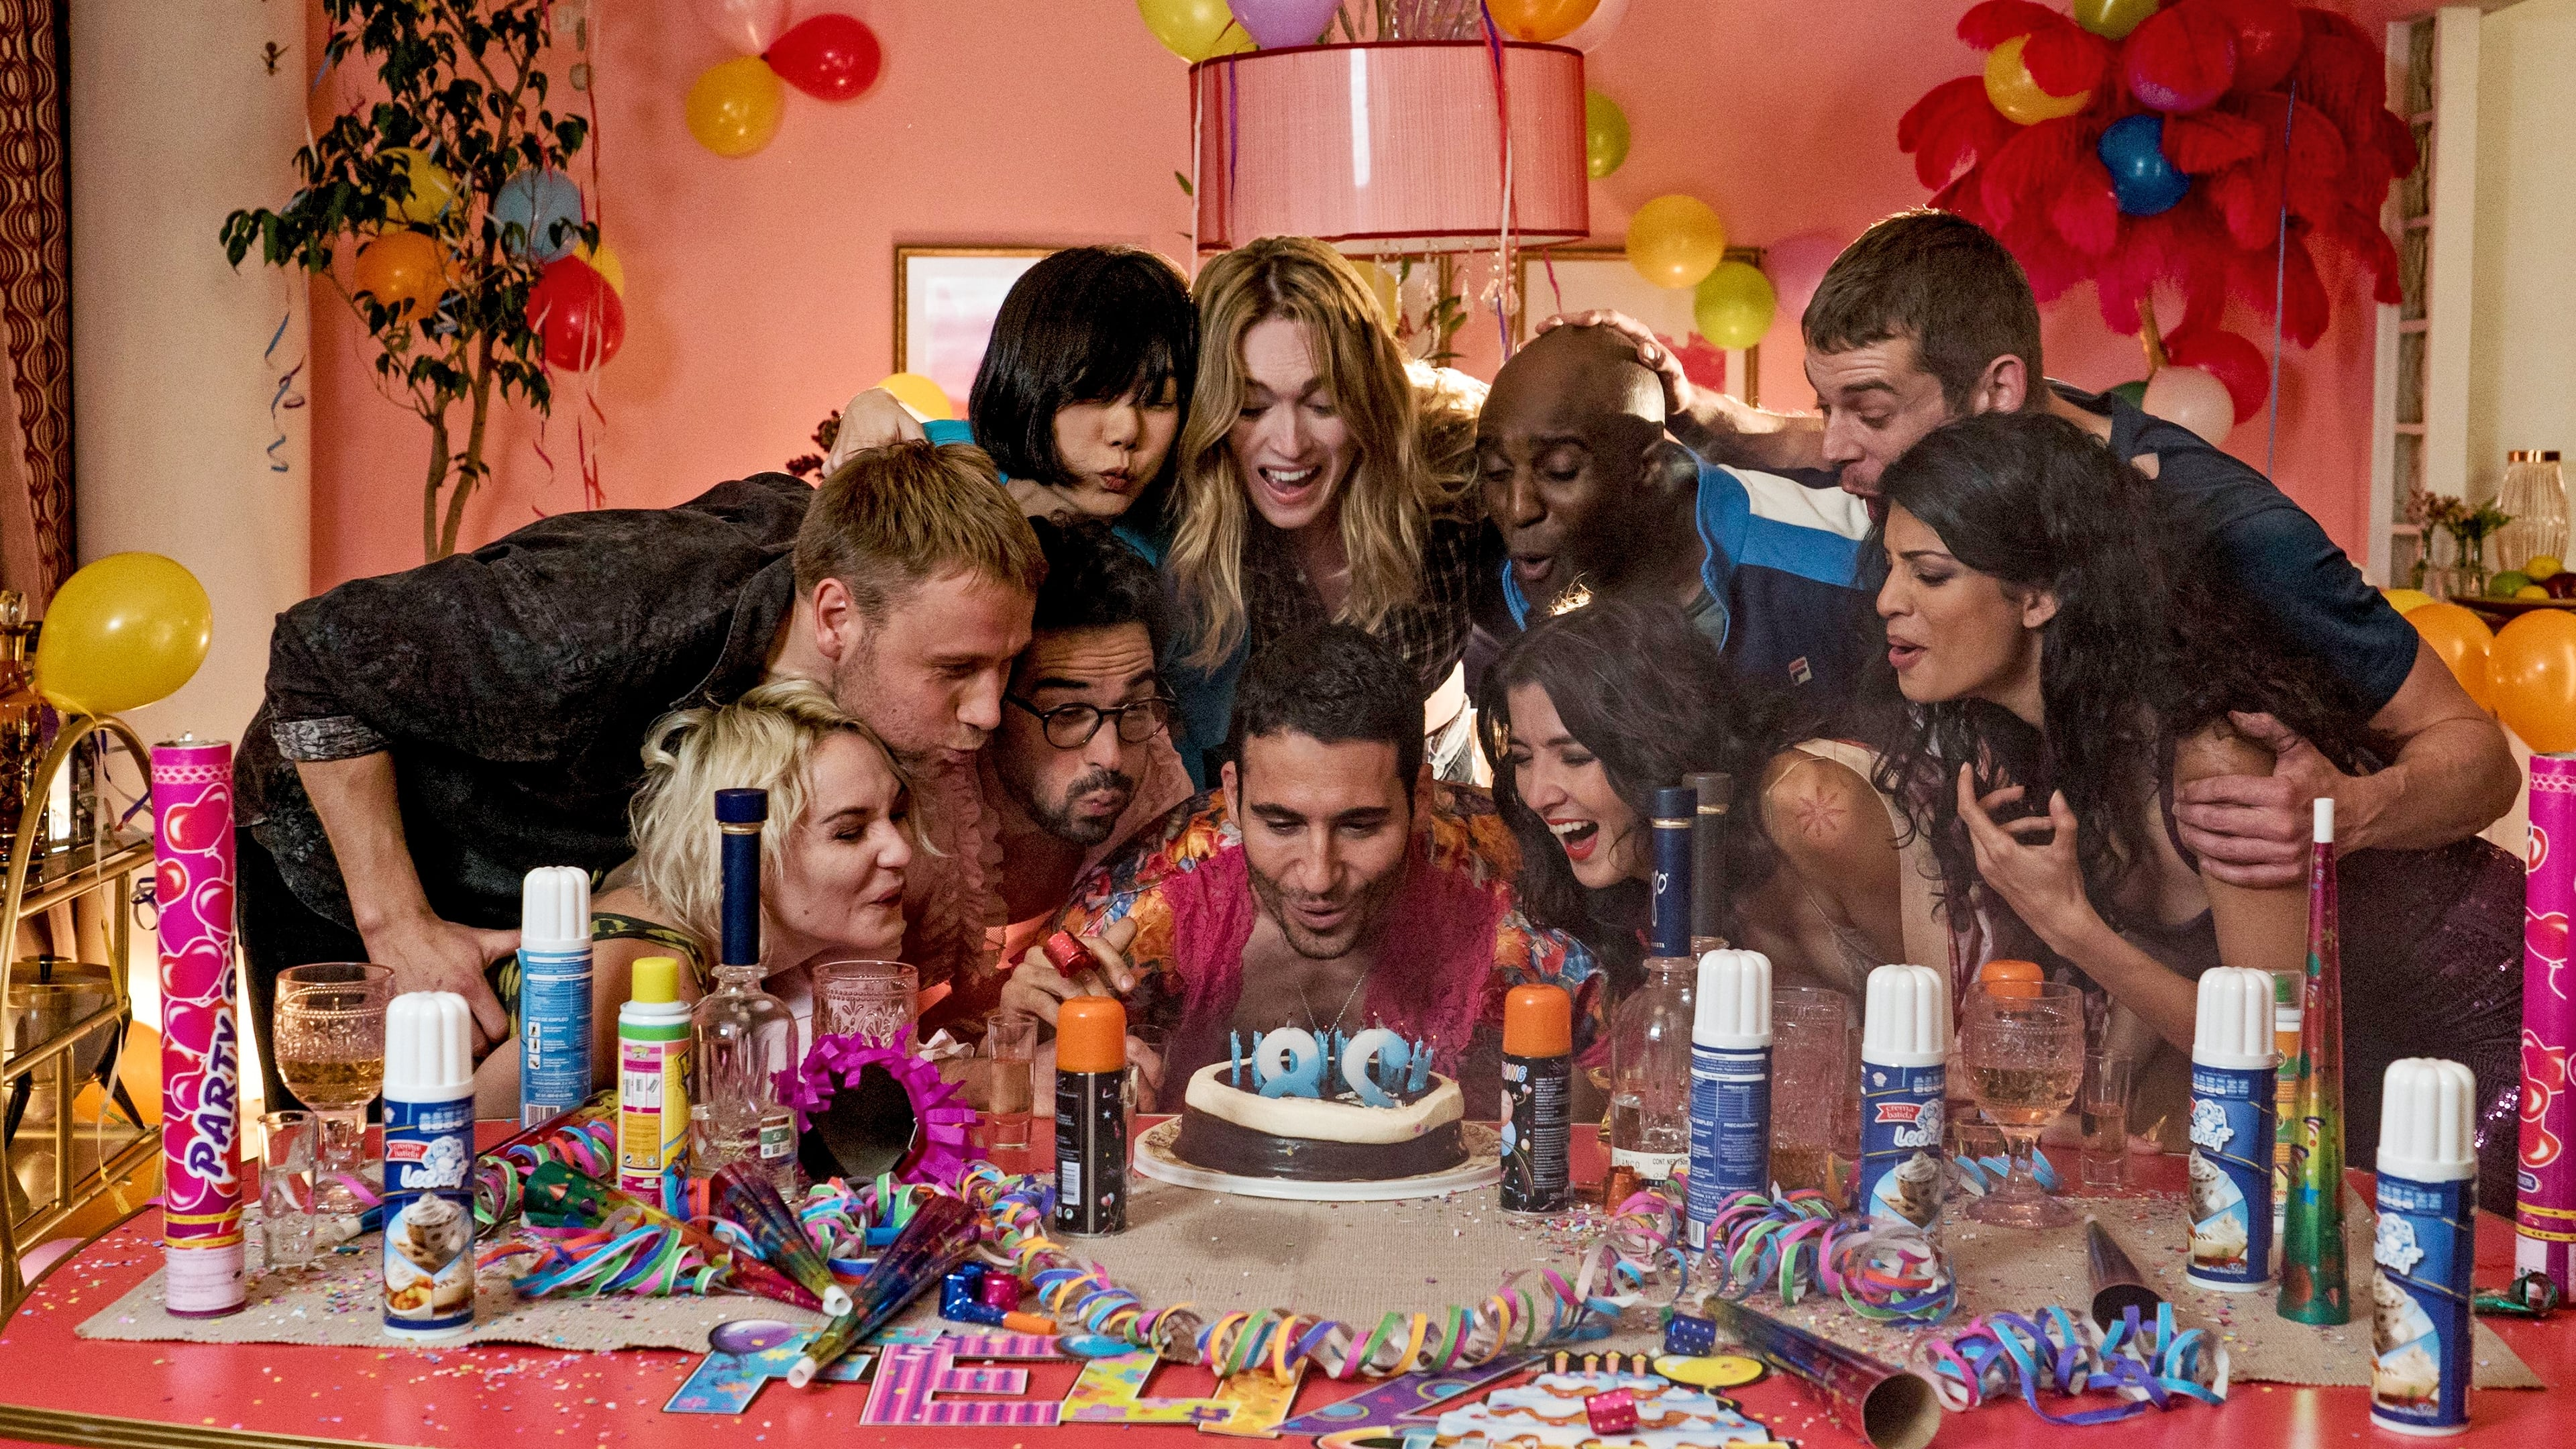 Sense8 - S2 E1 - Happy F*cking New Year